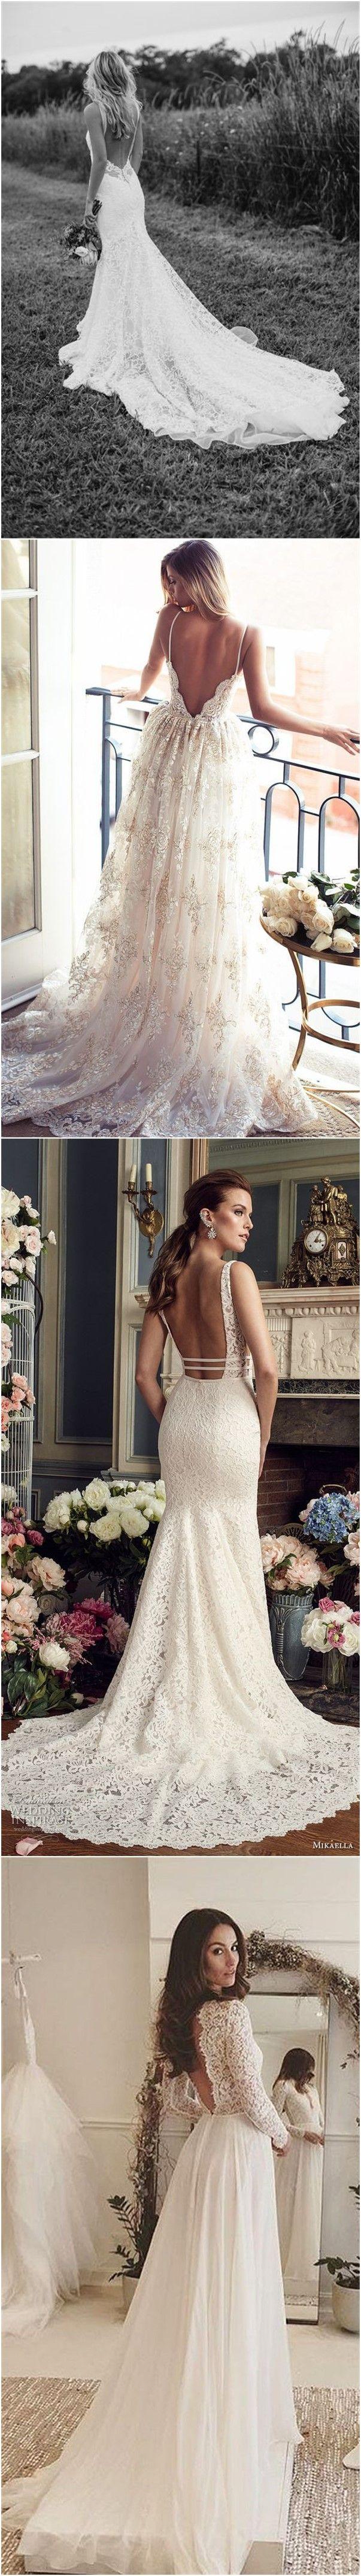 Wedding Dresses » 34 Stunning Open Back Wedding Dresses That Wow